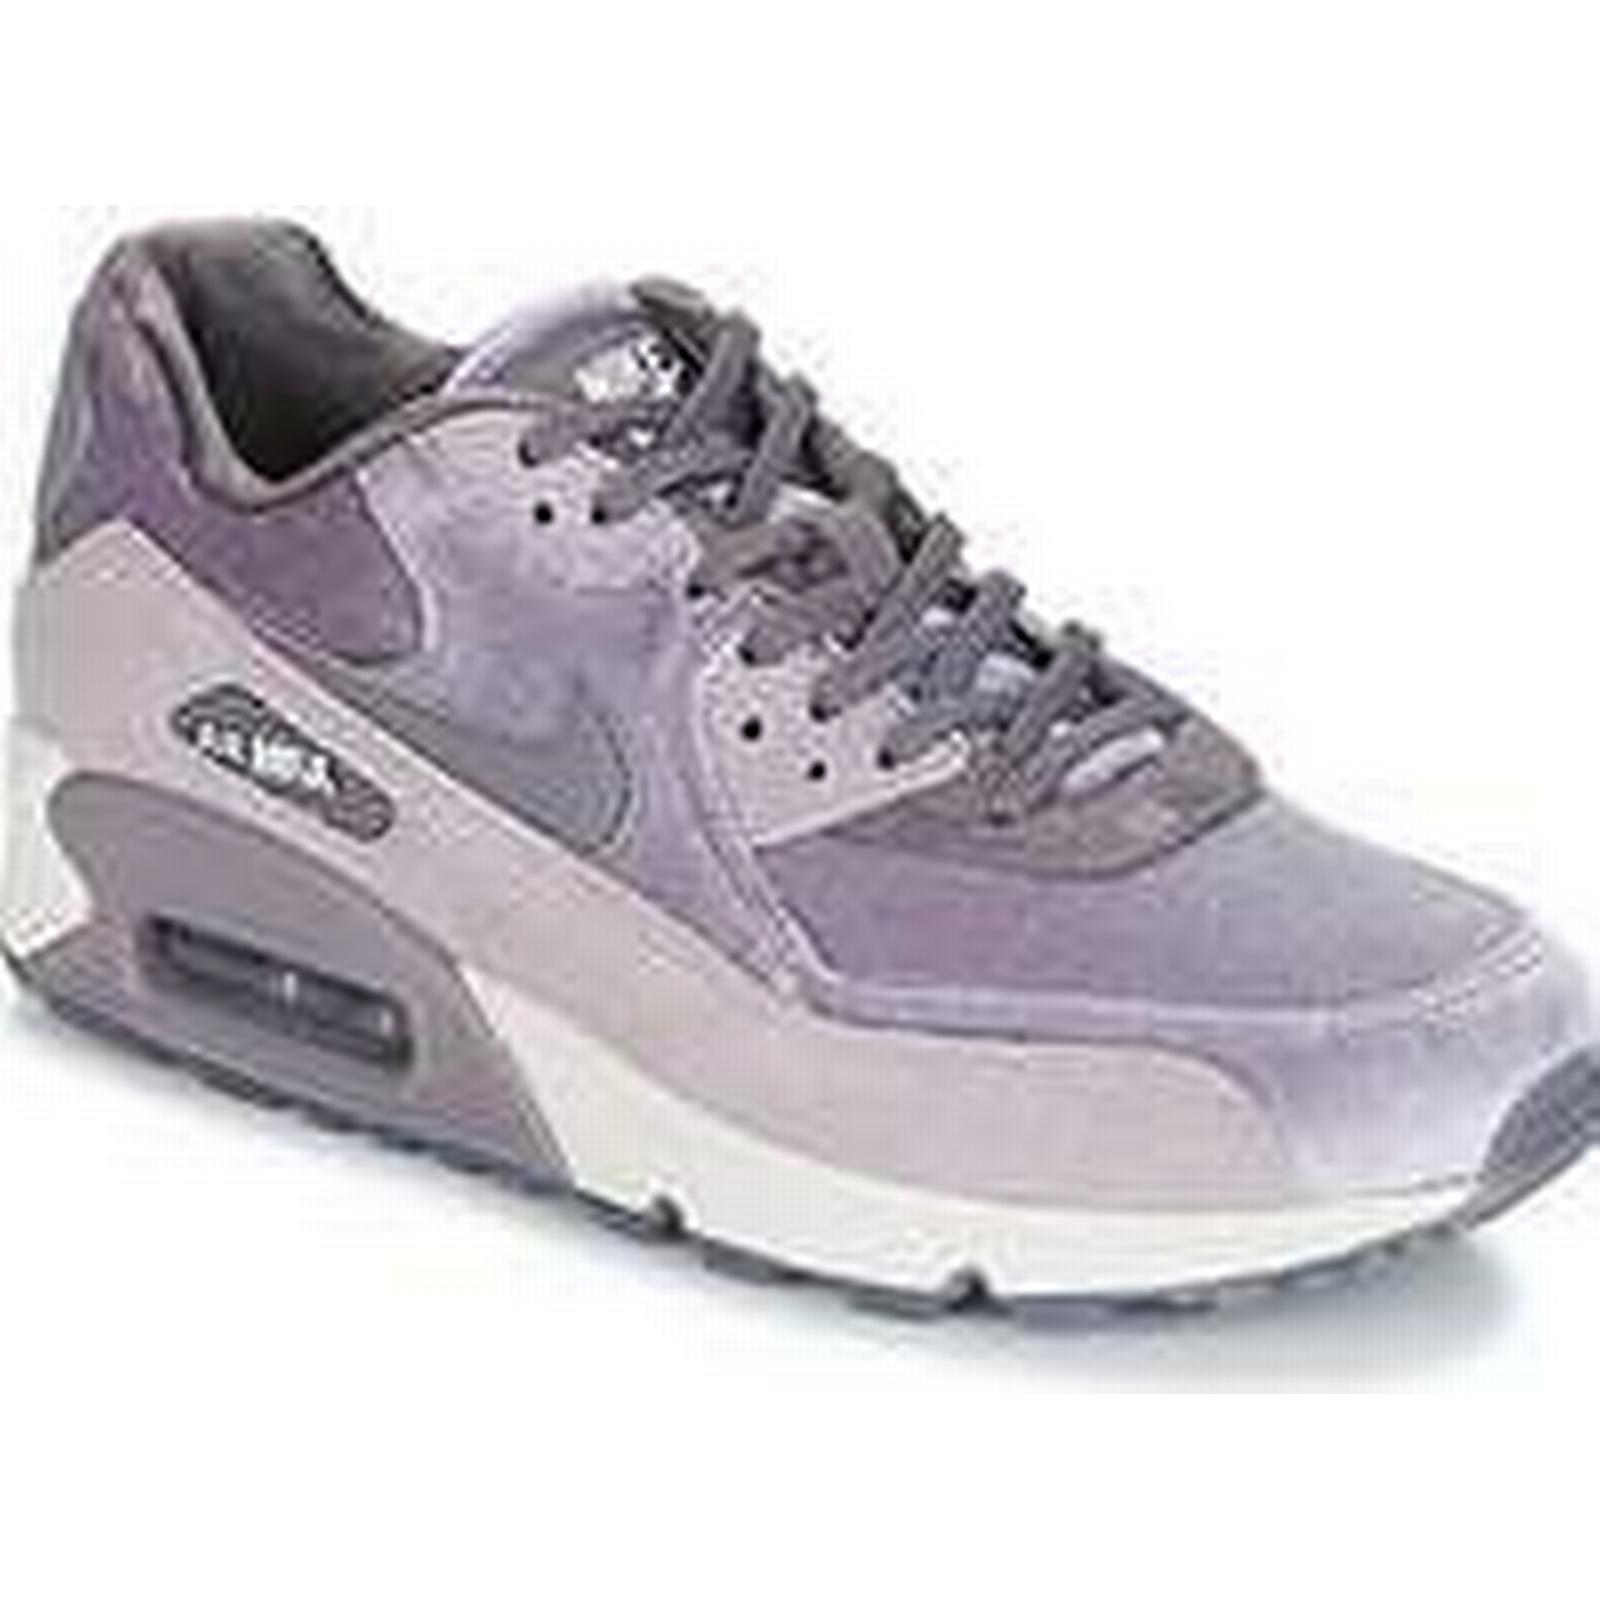 En Nike co ; Spartoo uk amp; Air Chaussure Max Formateurs O Lx S q7wTA